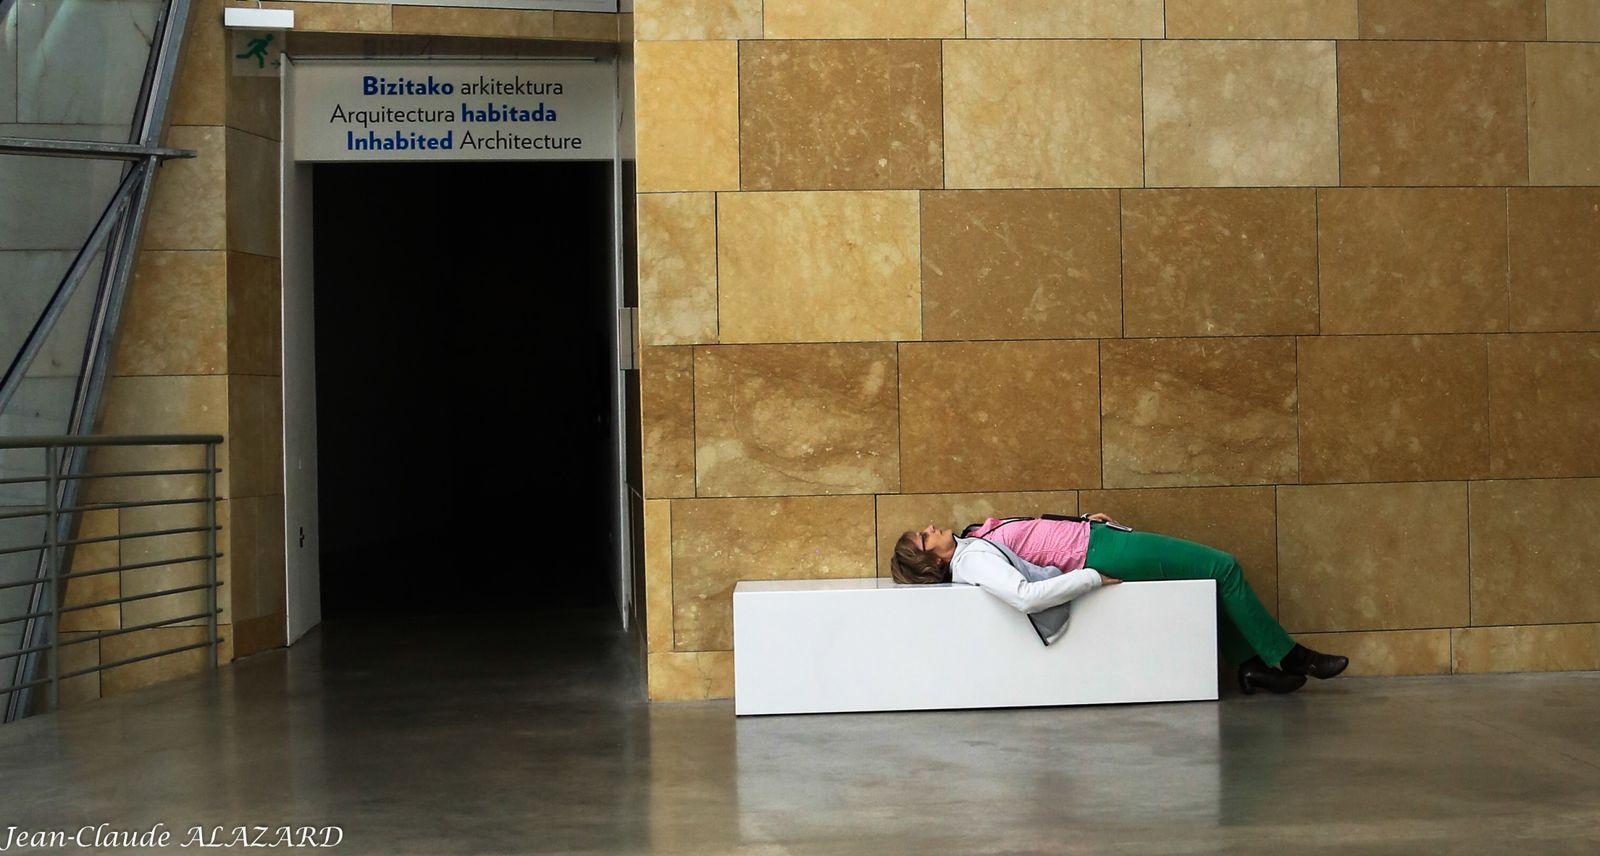 Le musée de Guggenheim